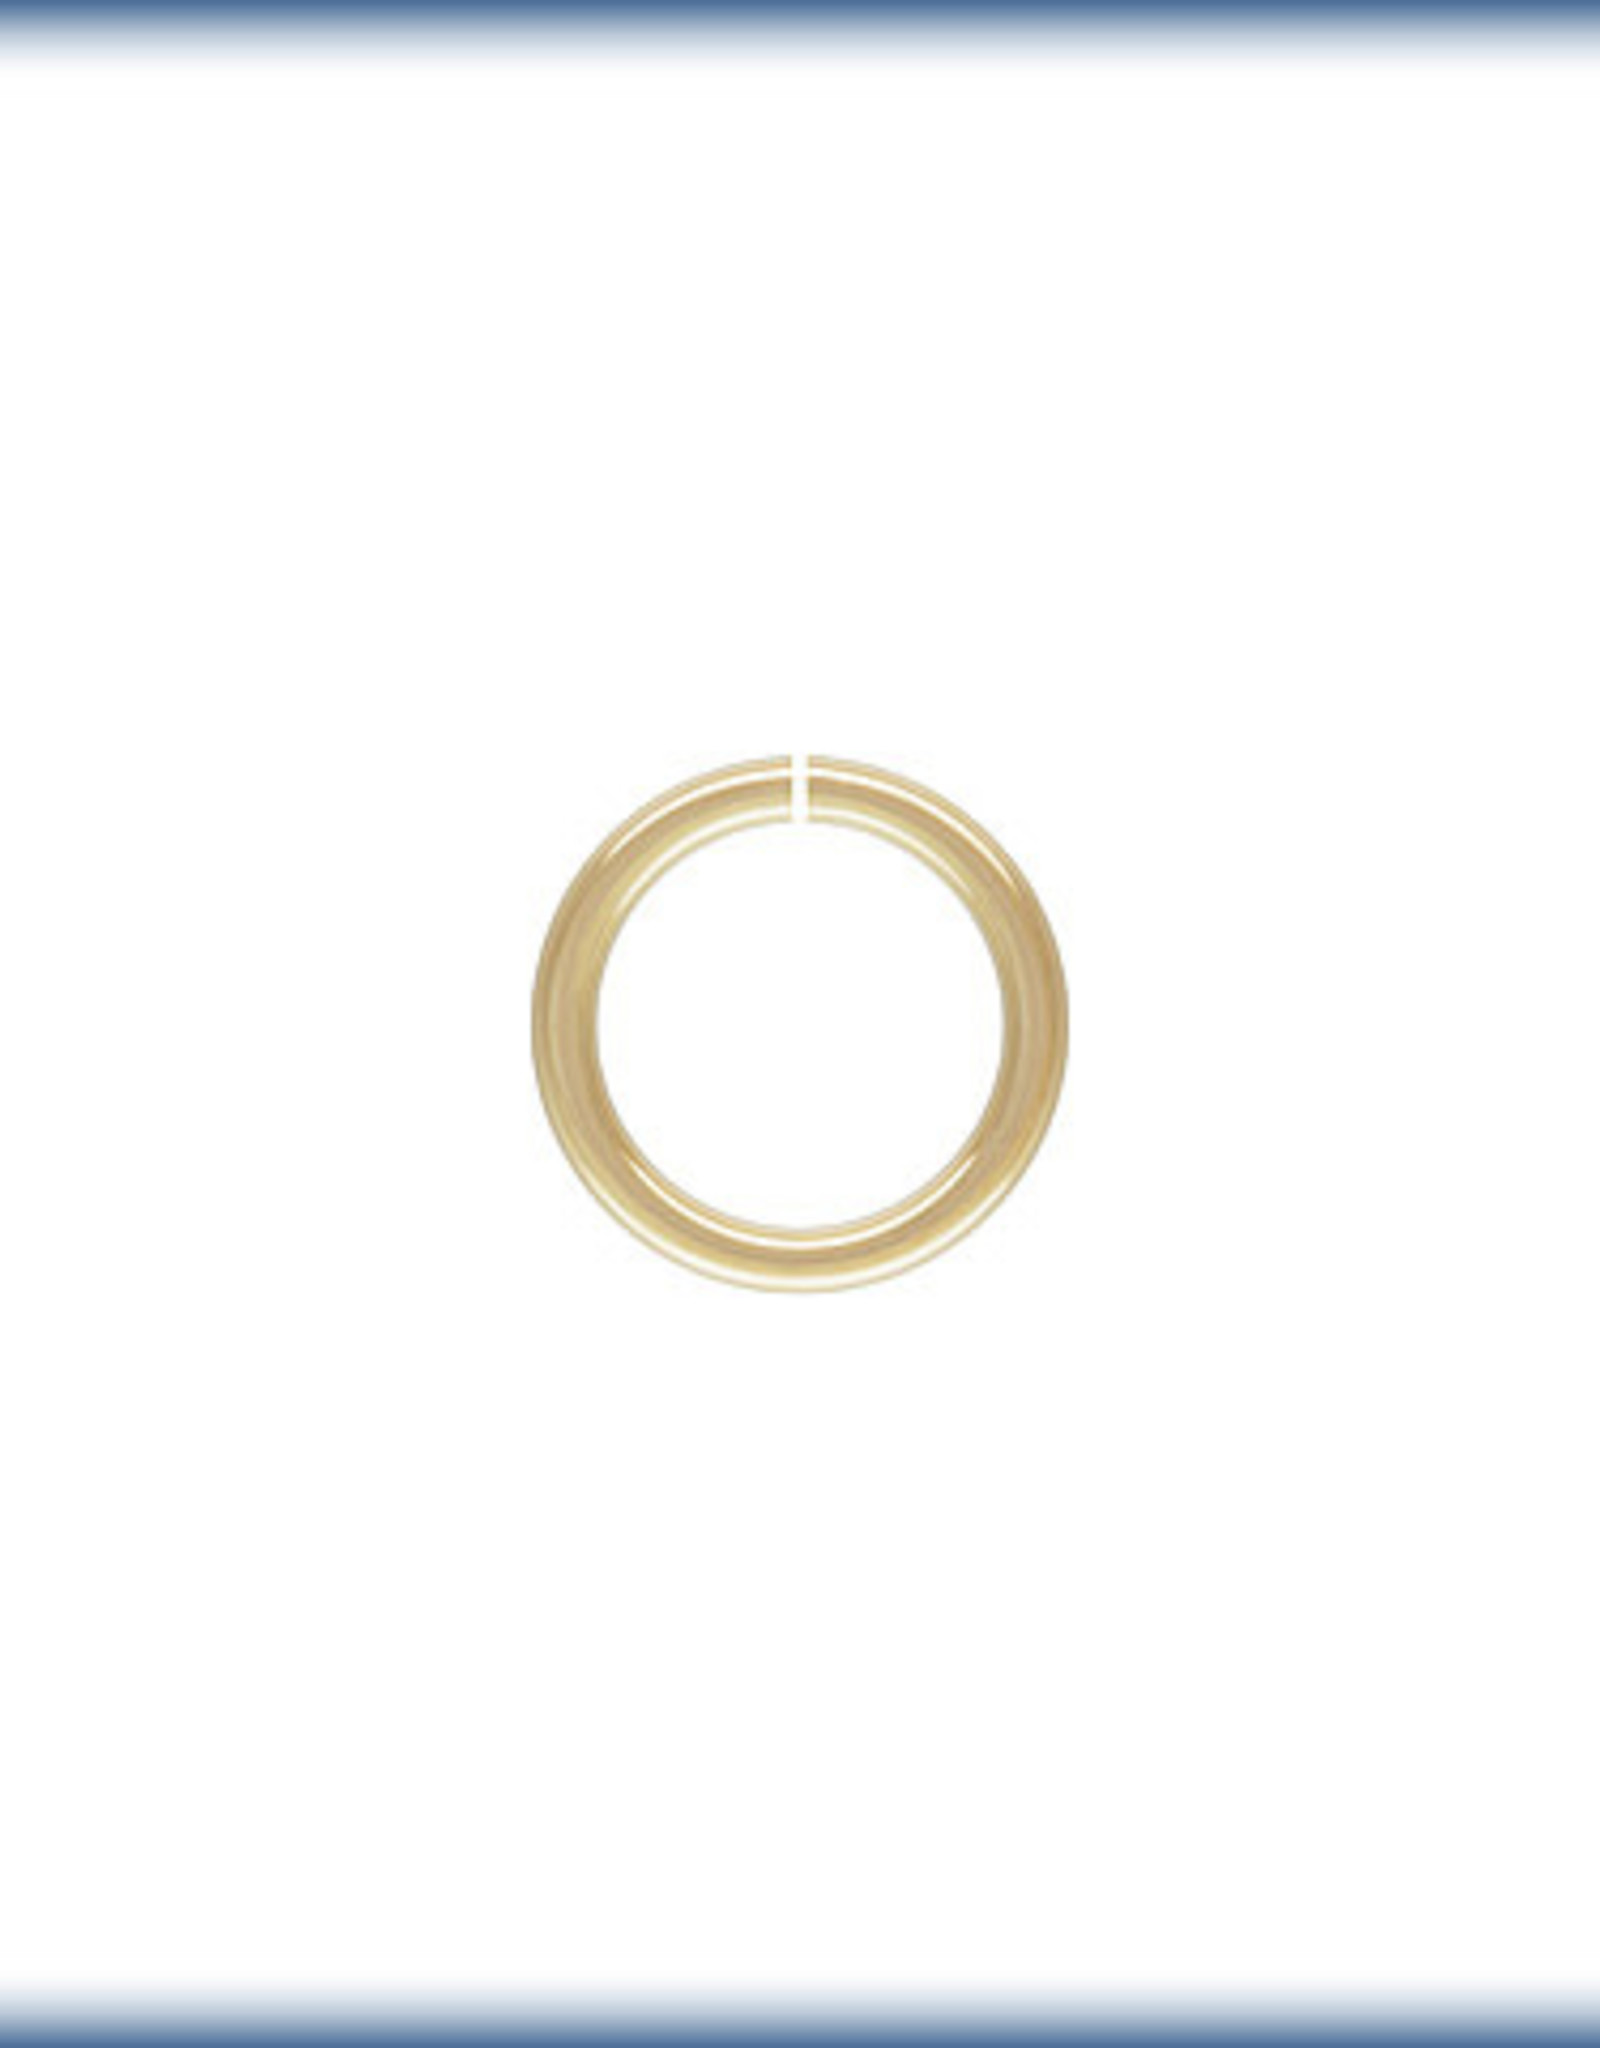 5mm Jump Ring 22ga 14k Gold Filled Qty 10